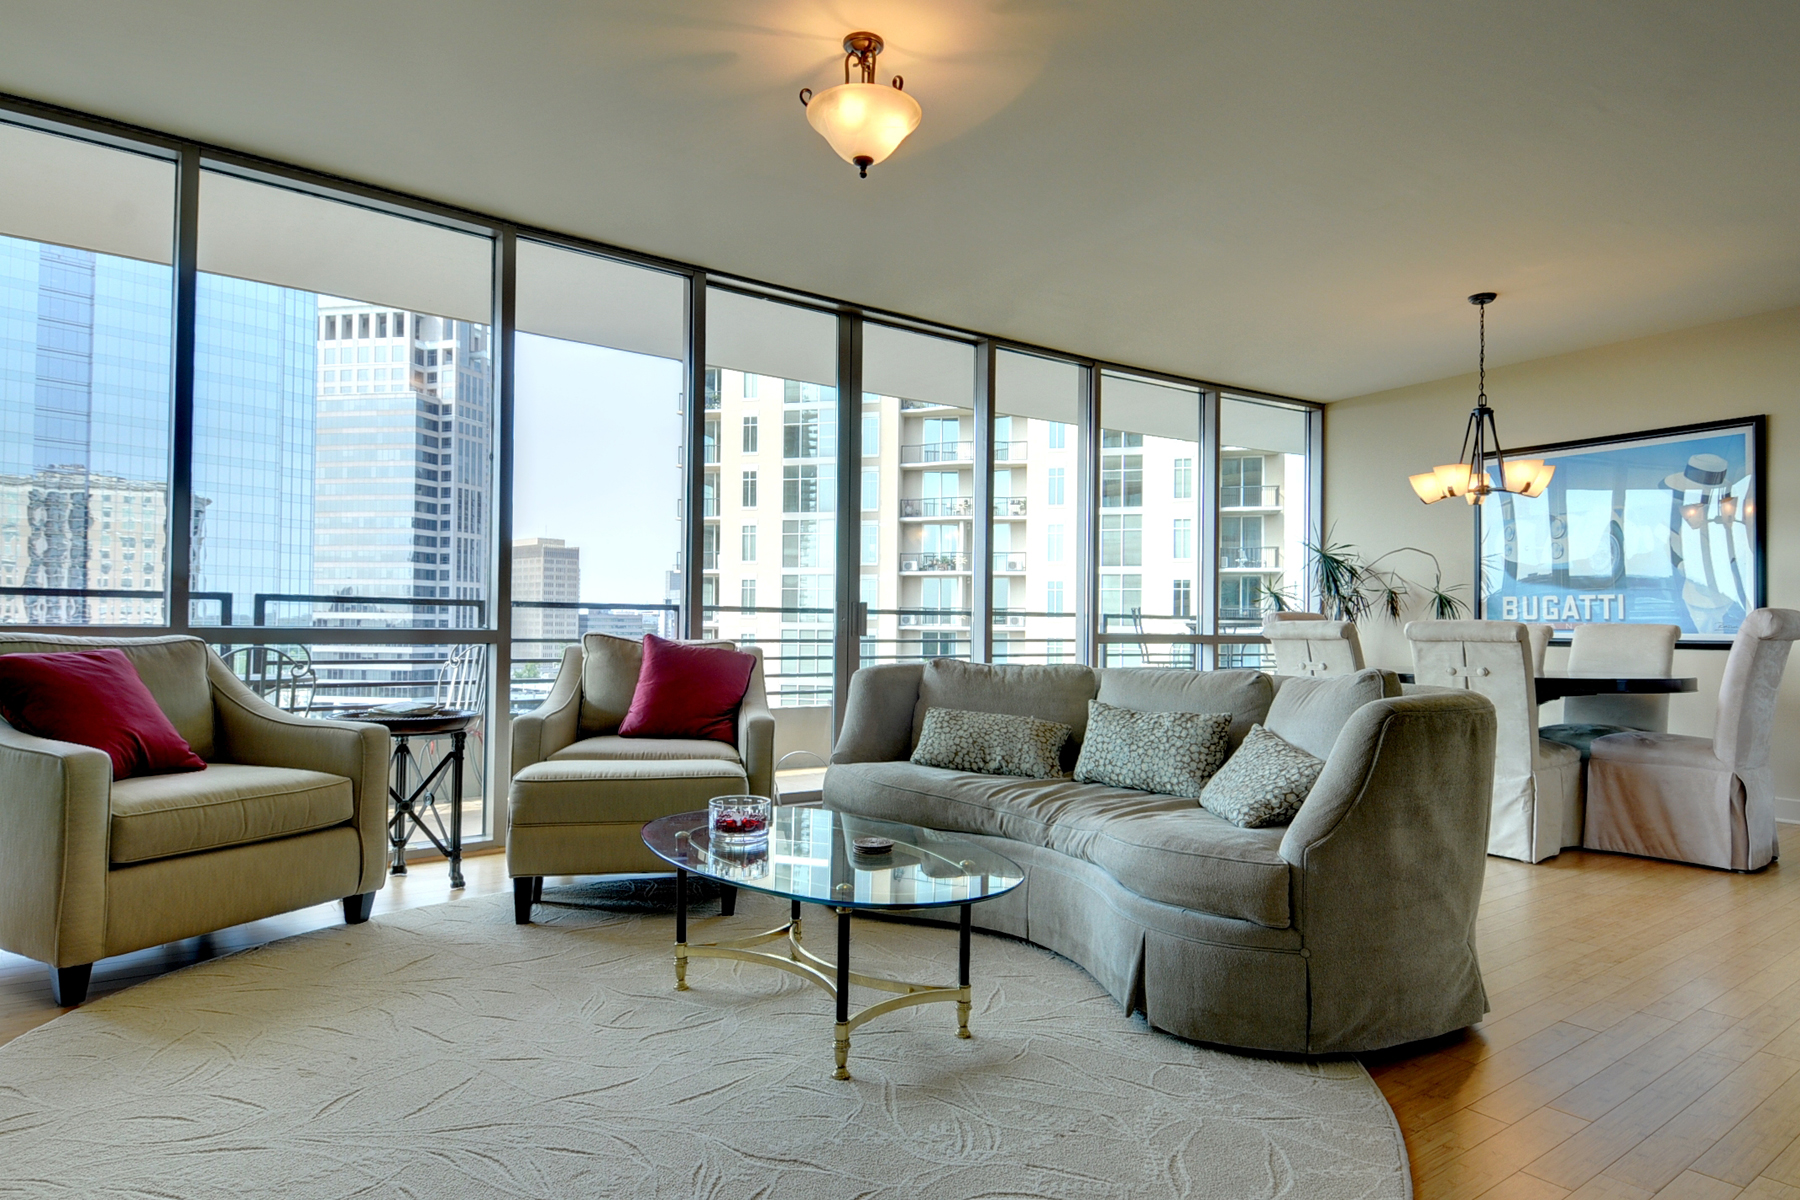 rentals property at Luxurious Buckhead Condo